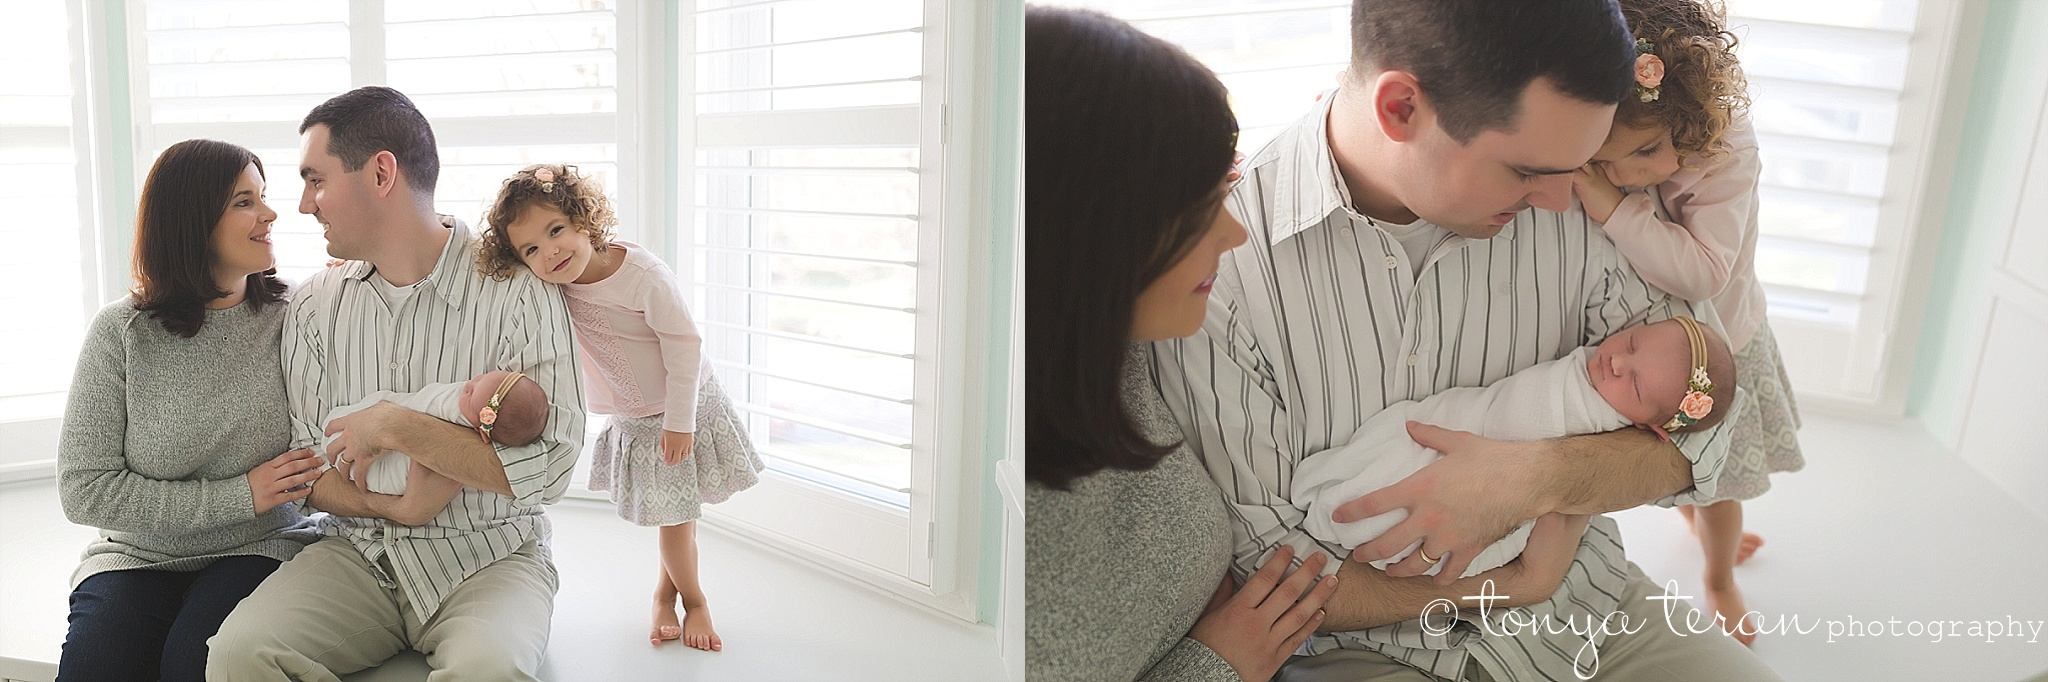 Best Maryland Newborn Lifestyle Session | Tonya Teran Photography, Gaithersburg, MD Newborn, Baby, and Family Photographer